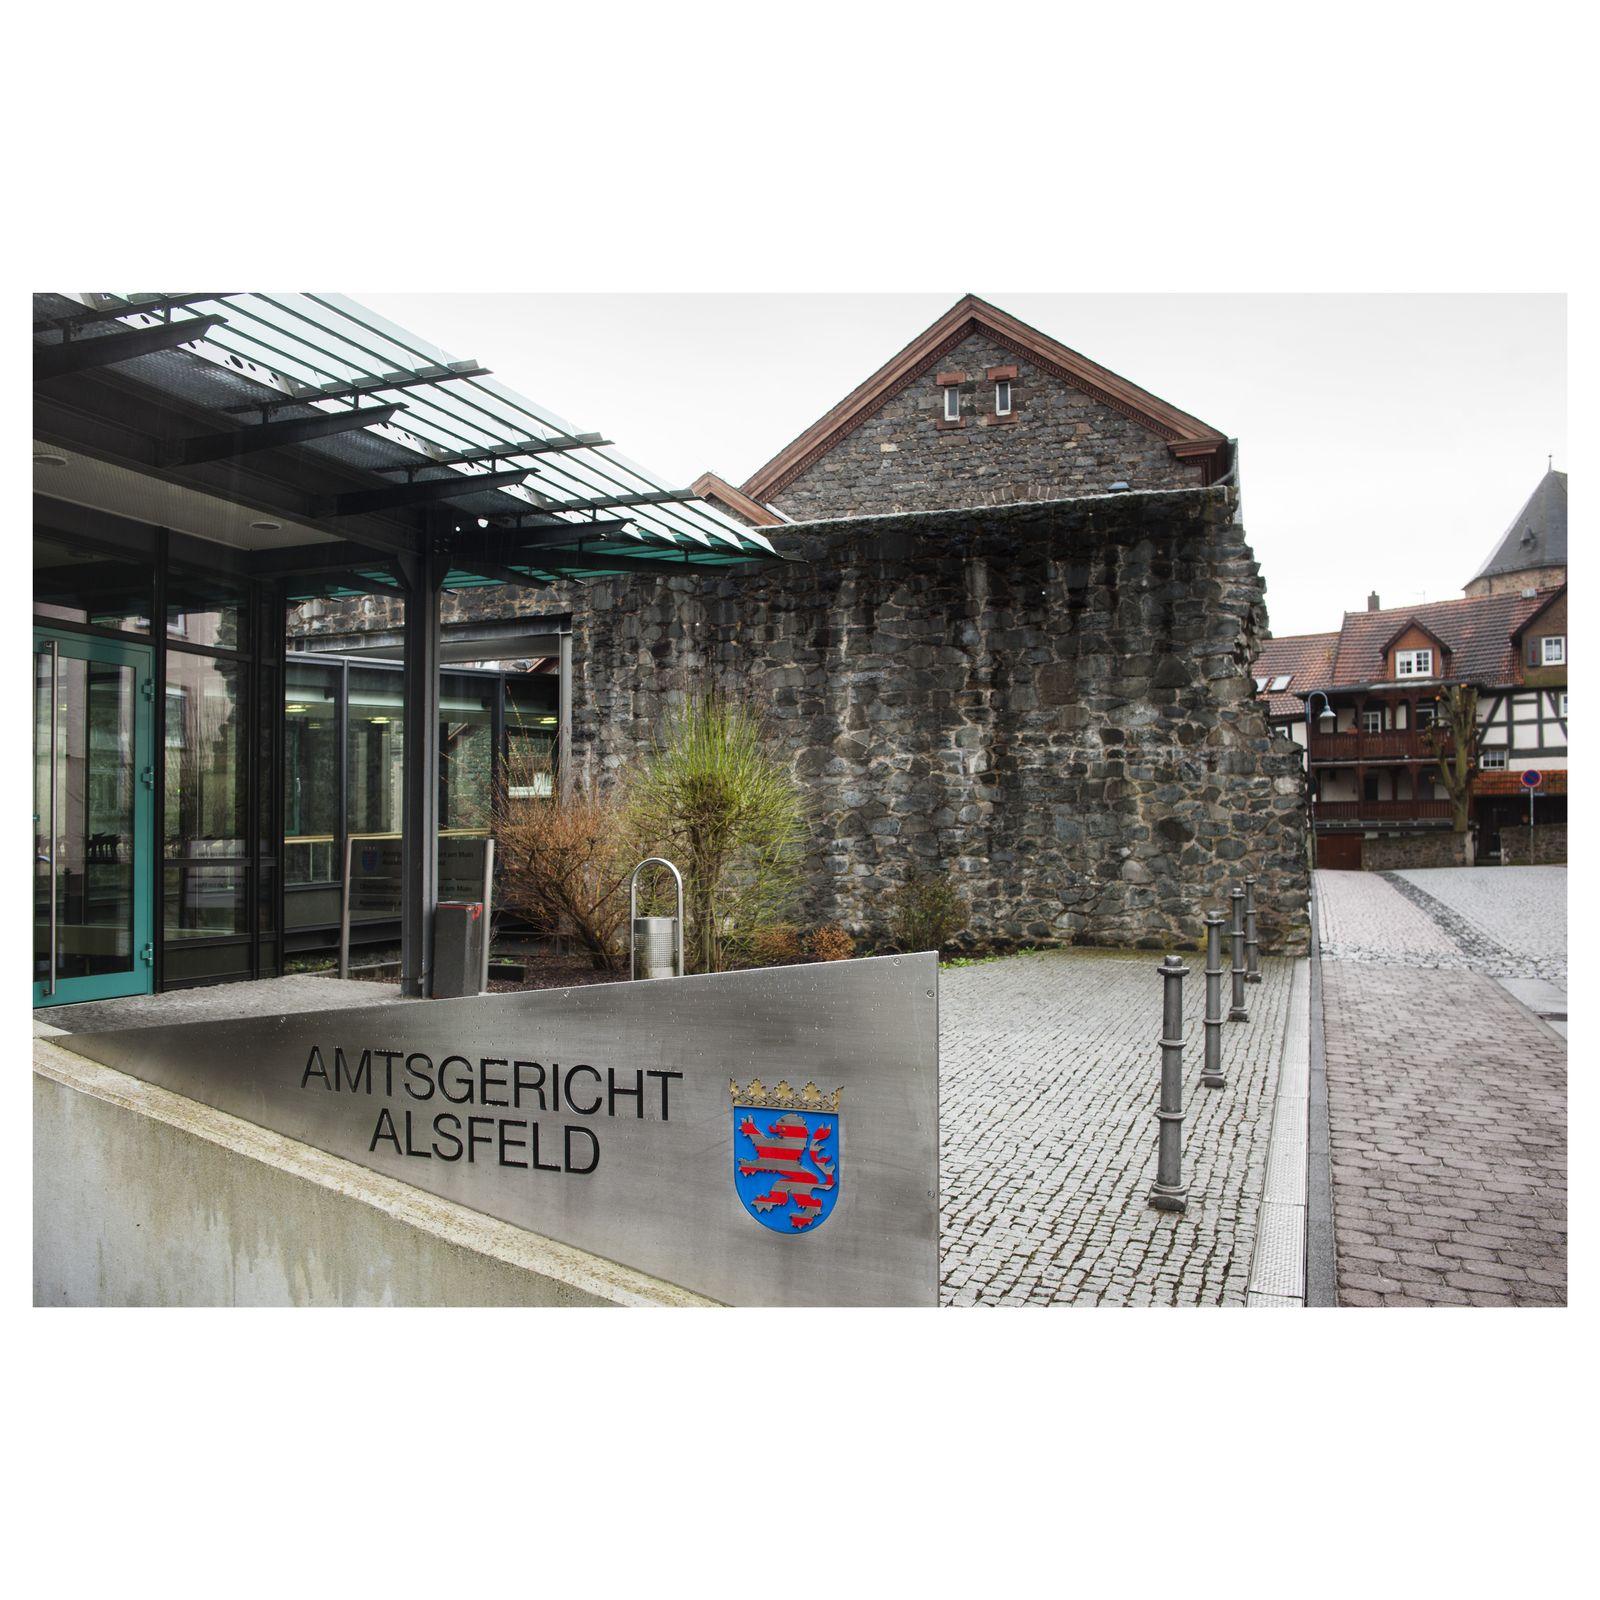 EINMALIGE VERWENDUNG Prozess/ / Marie Luise Christina Stoeppler/ Amtsgericht Alsfeld